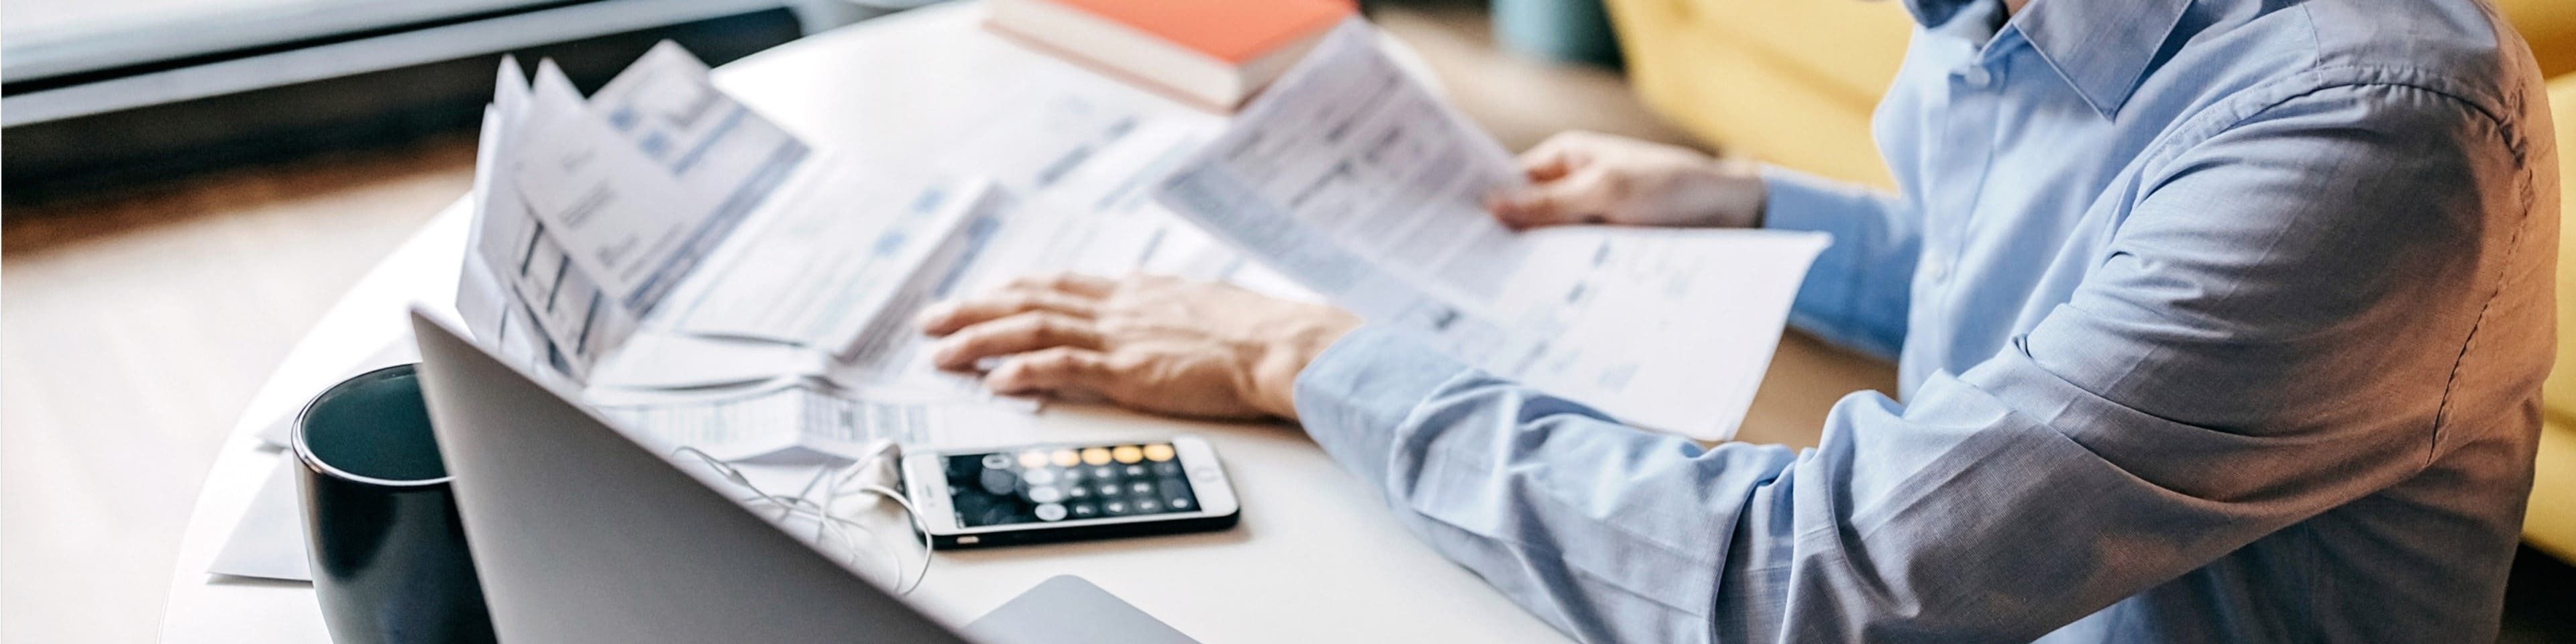 Webinar - CCH Personal Tax - Dec 2020